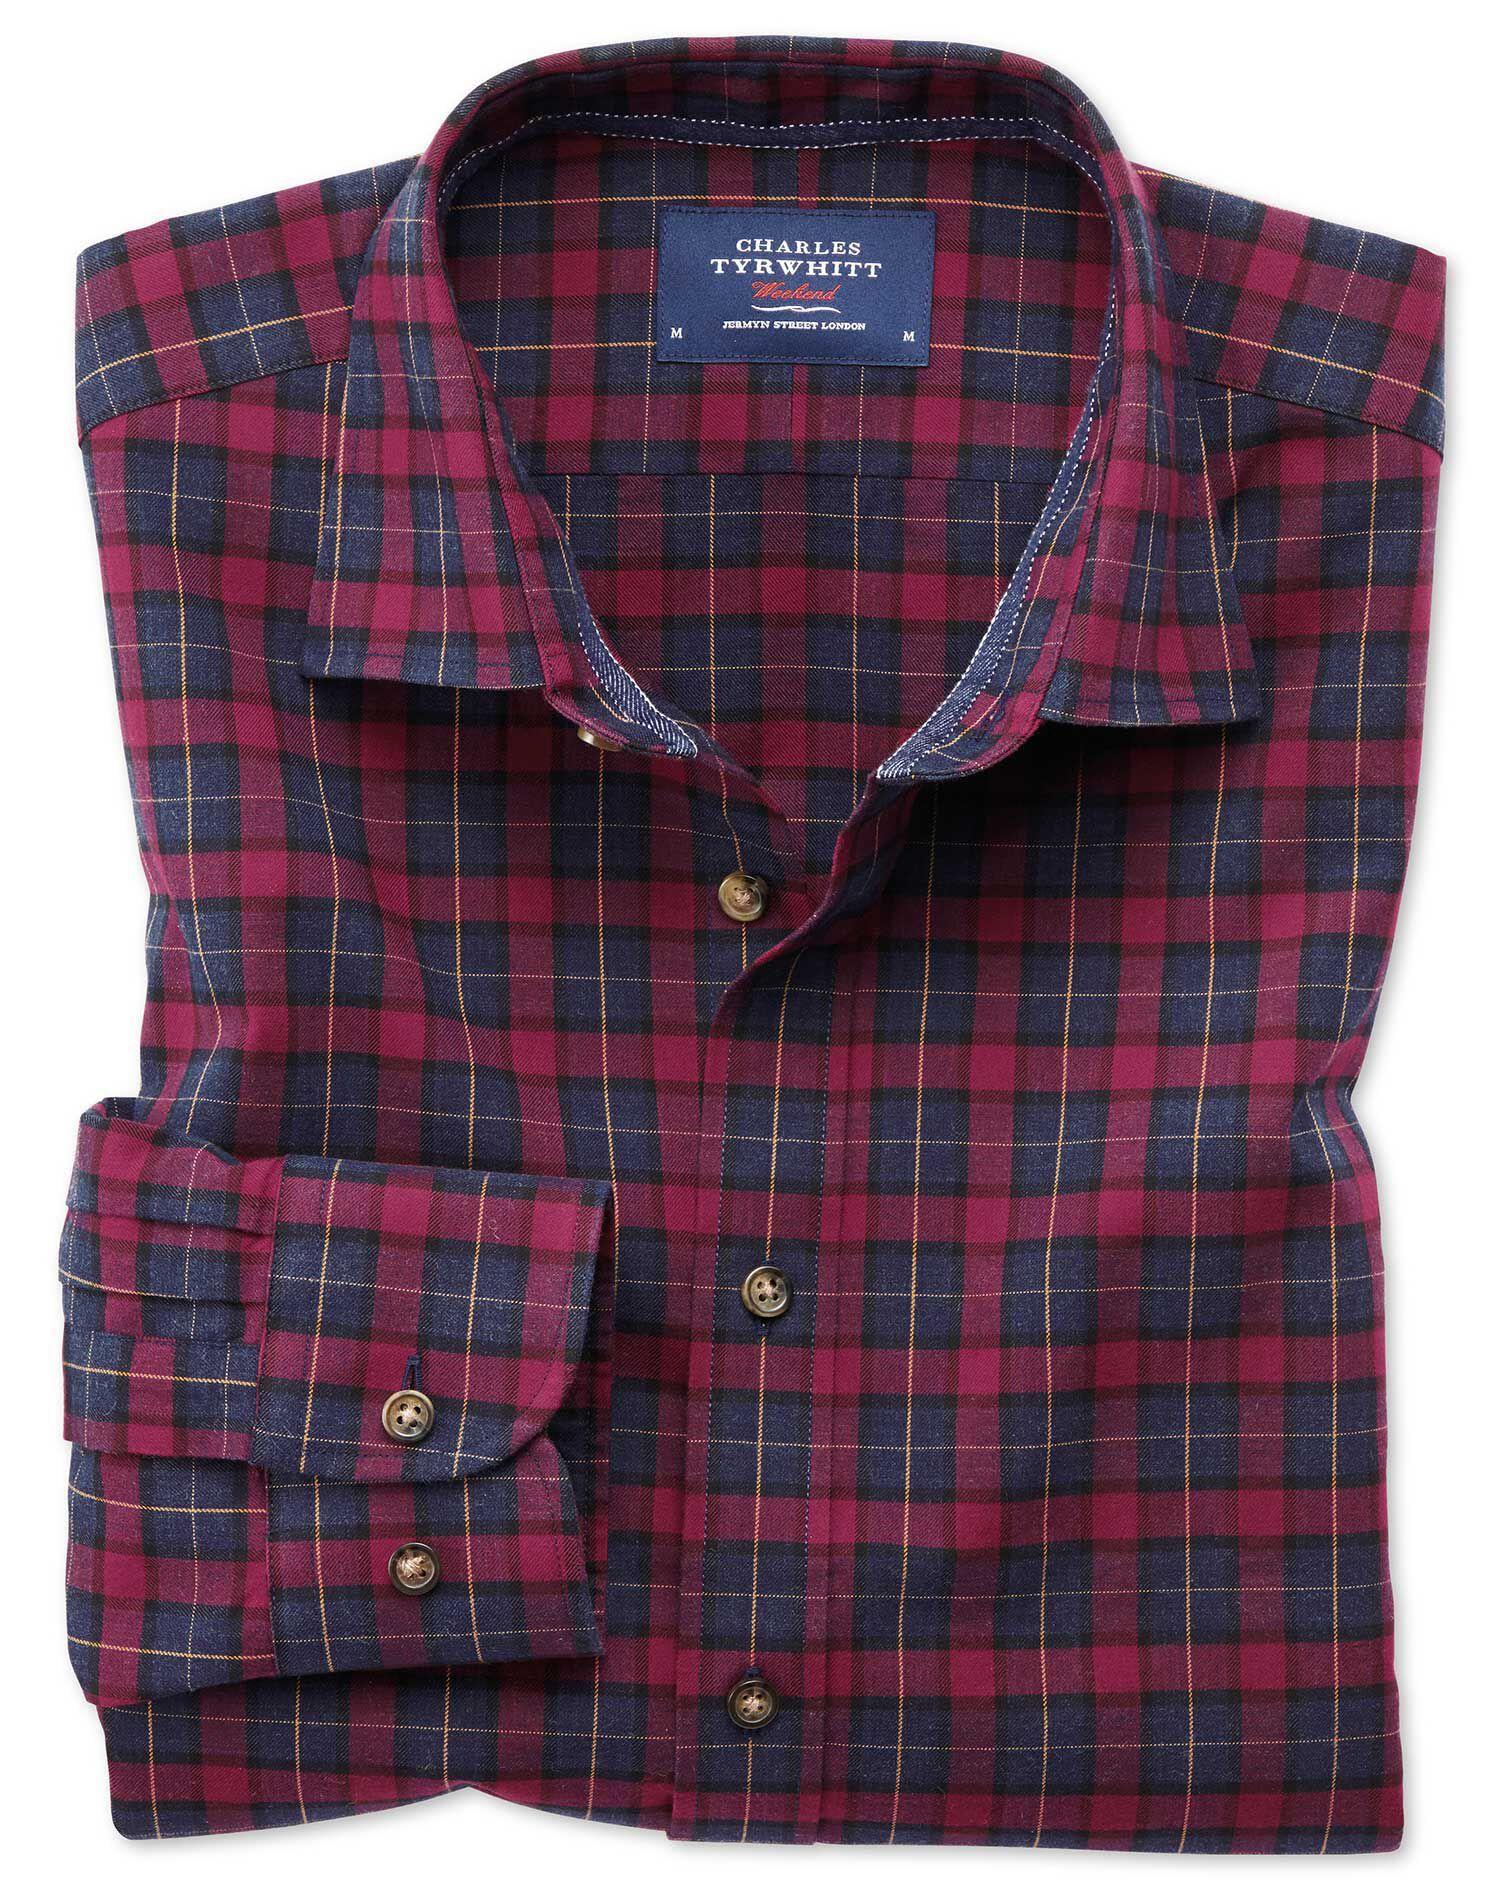 Slim Fit Heather Tartan Burgundy and Navy Blue Check Cotton Shirt Single Cuff Size Medium by Charles